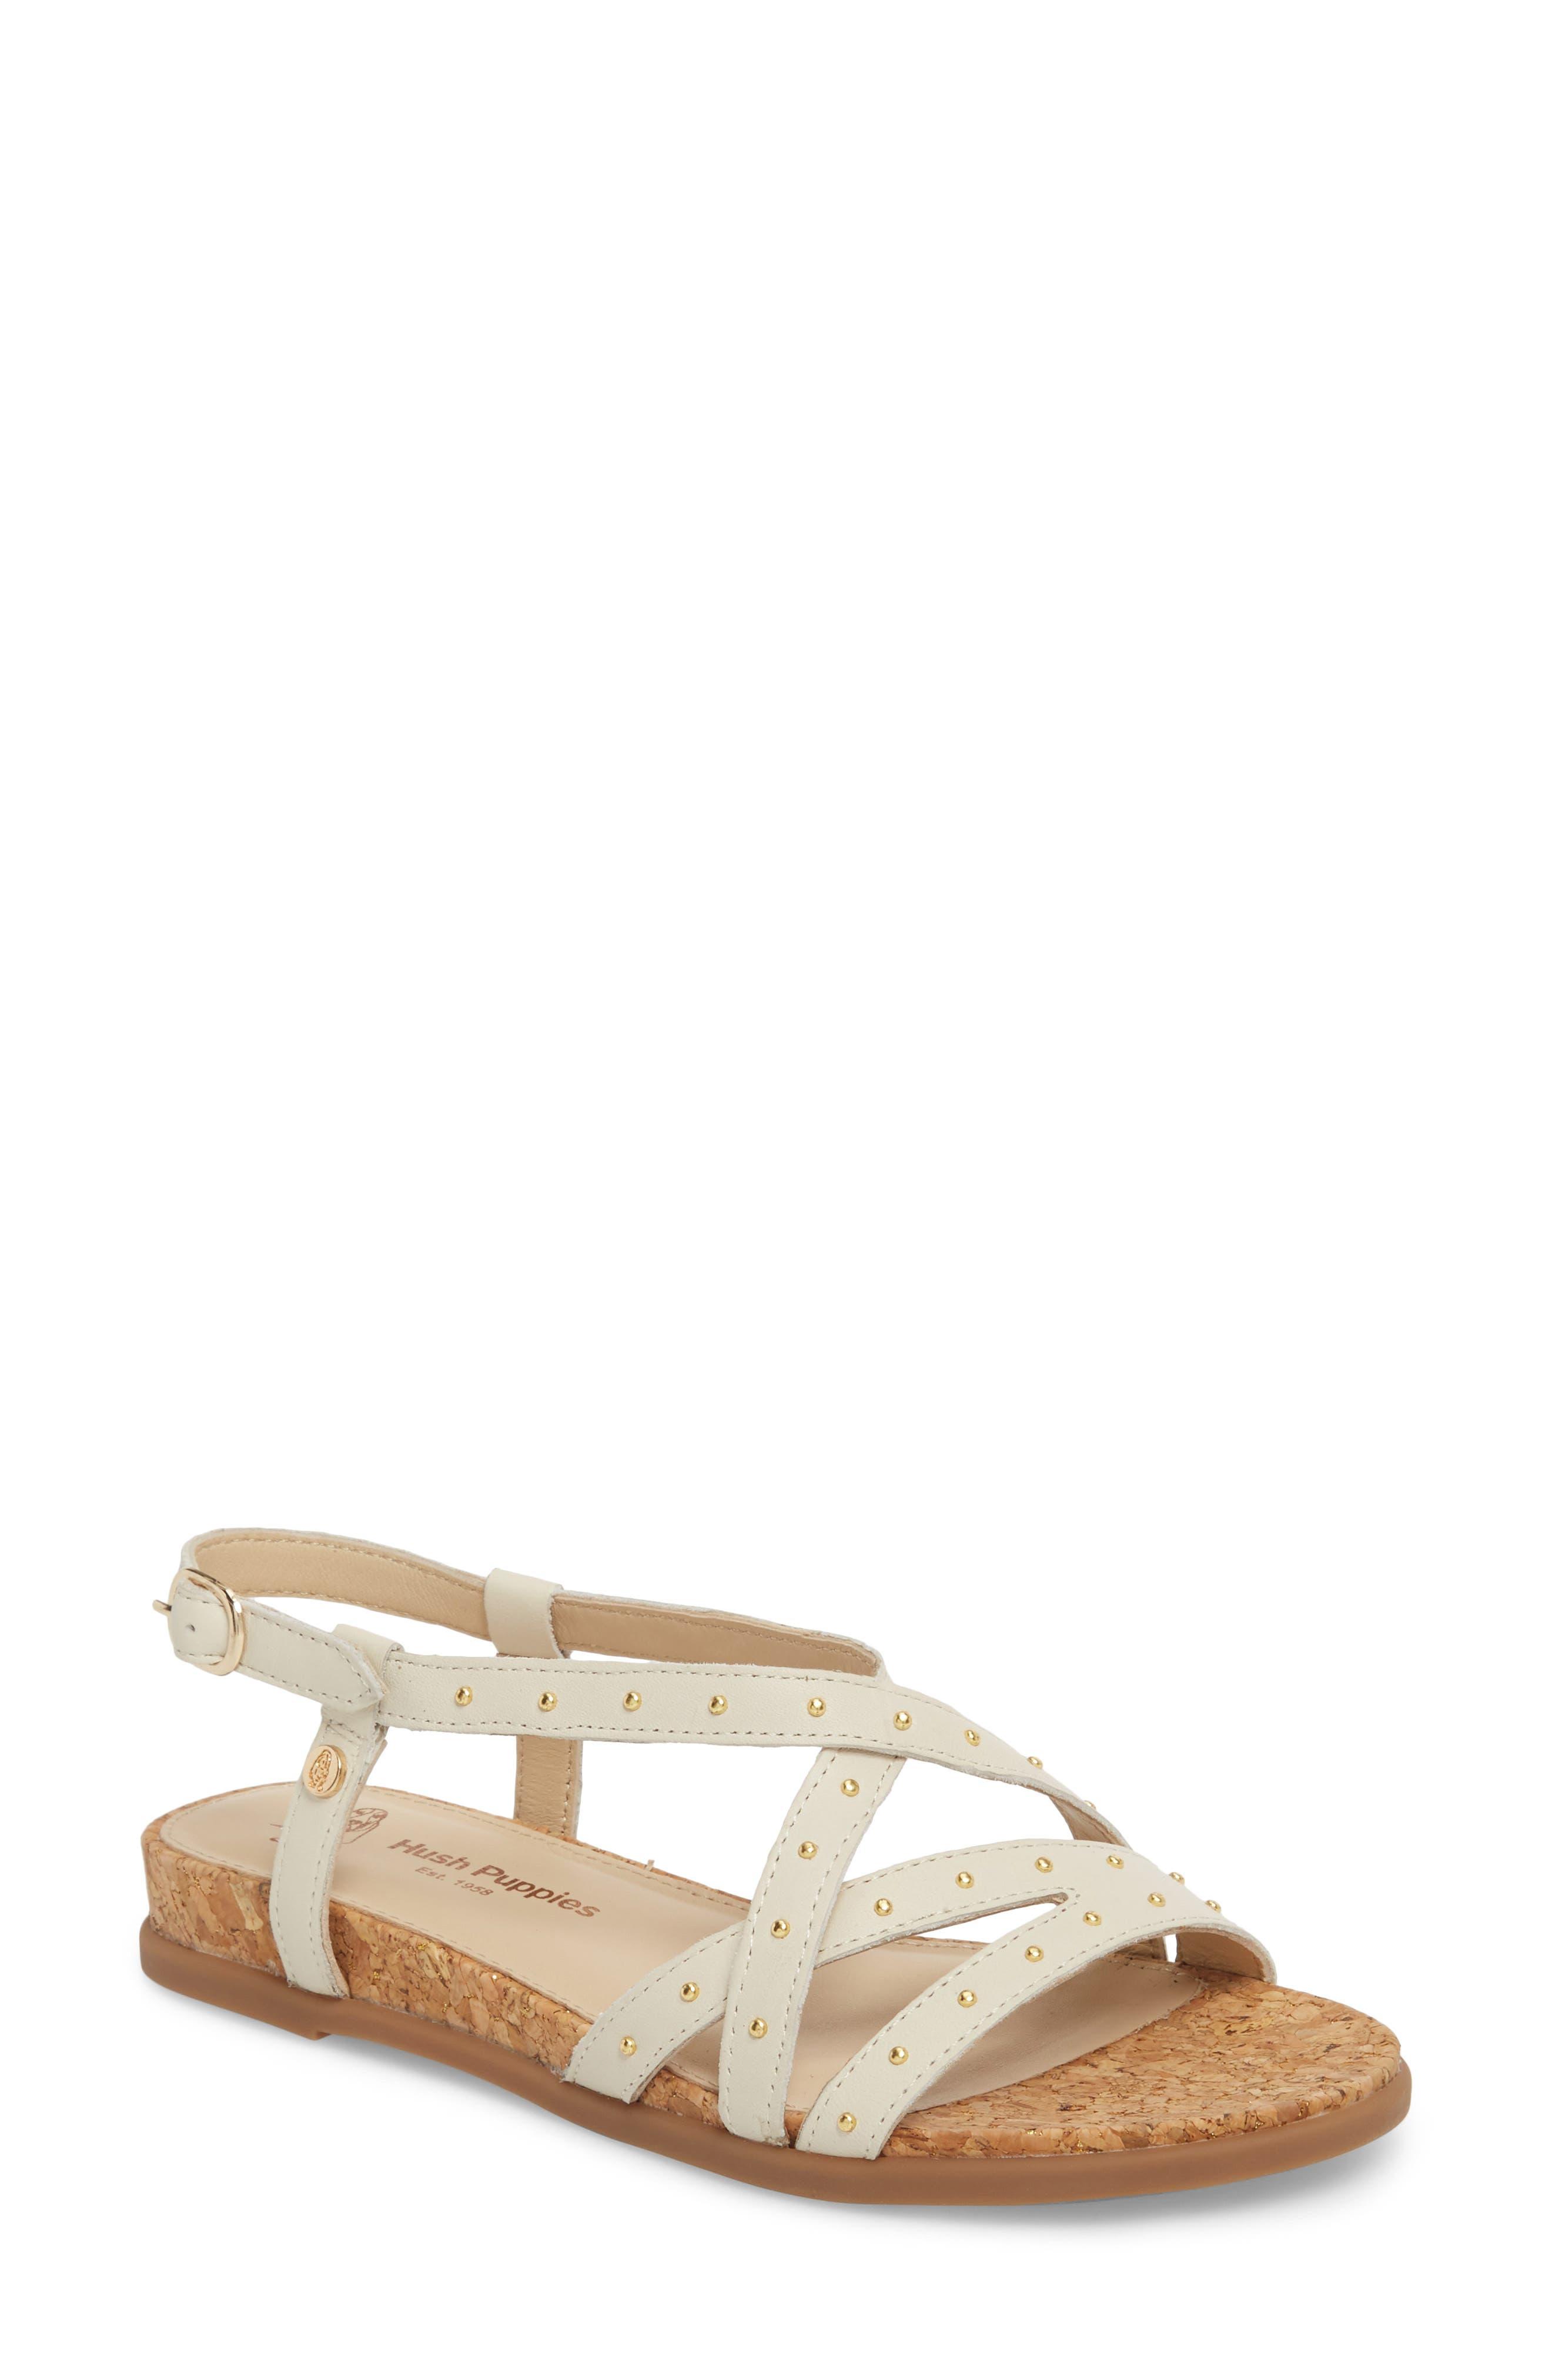 Dalmatian Studded Sandal,                             Main thumbnail 1, color,                             Ivory Leather